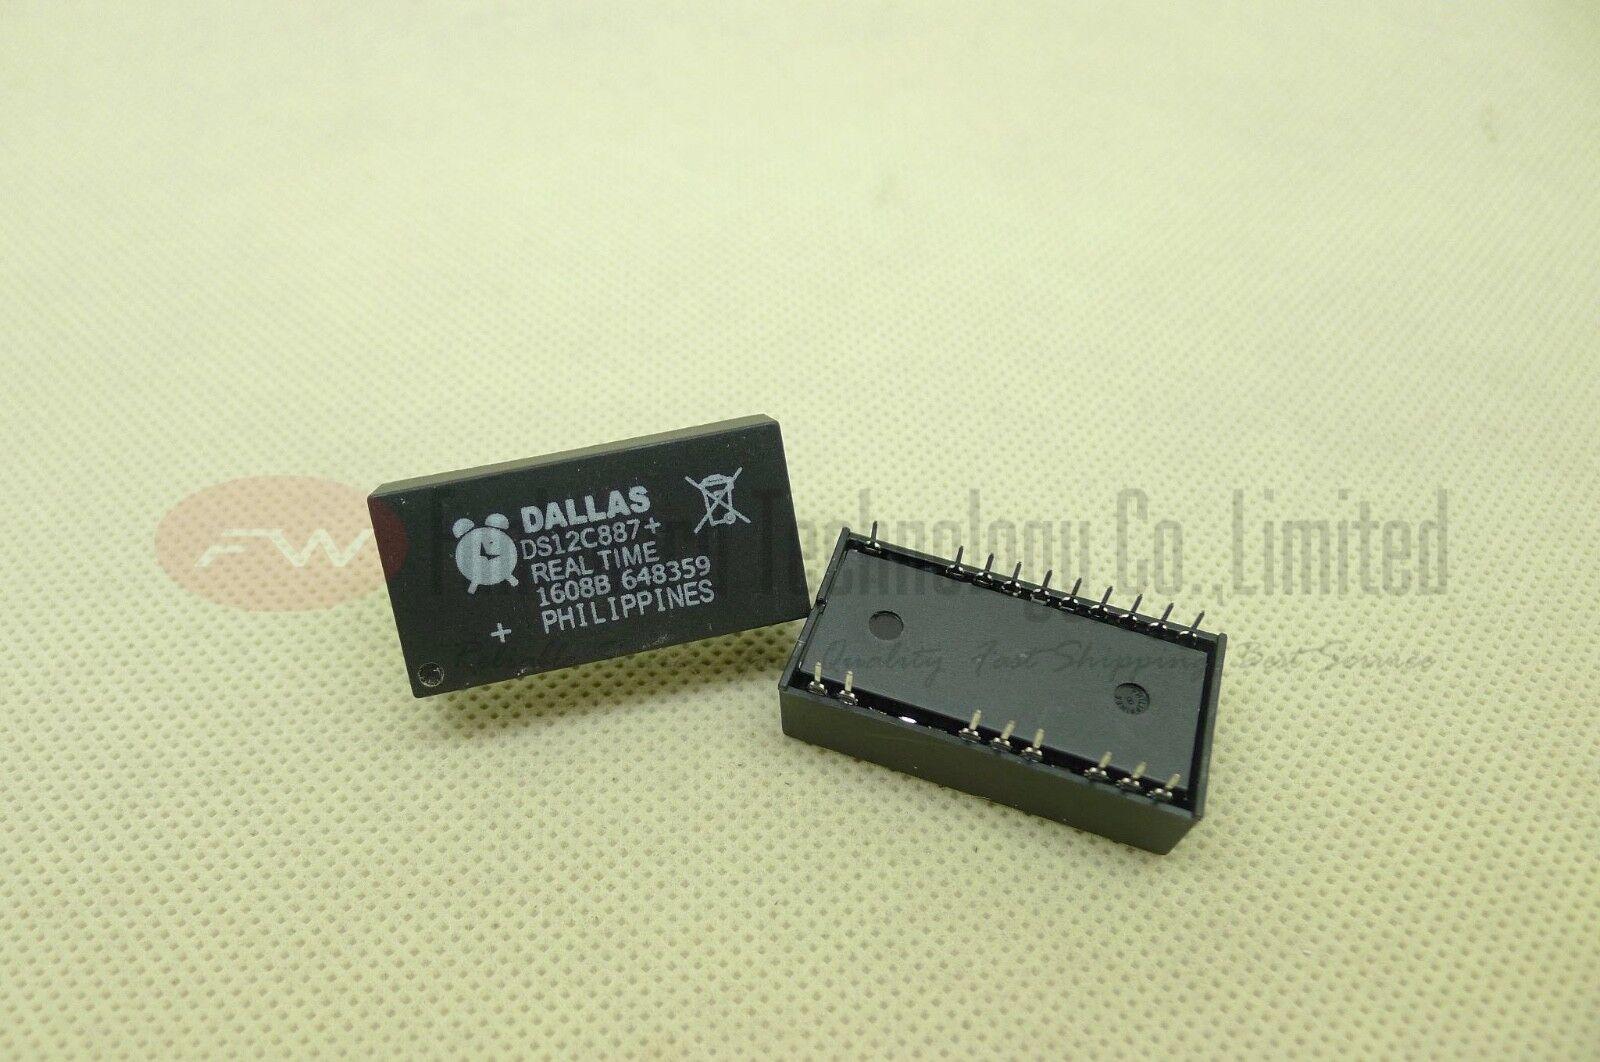 DS12C887 DS12887 12C887 Real Time Clock NEW 1 PCS DS12C887